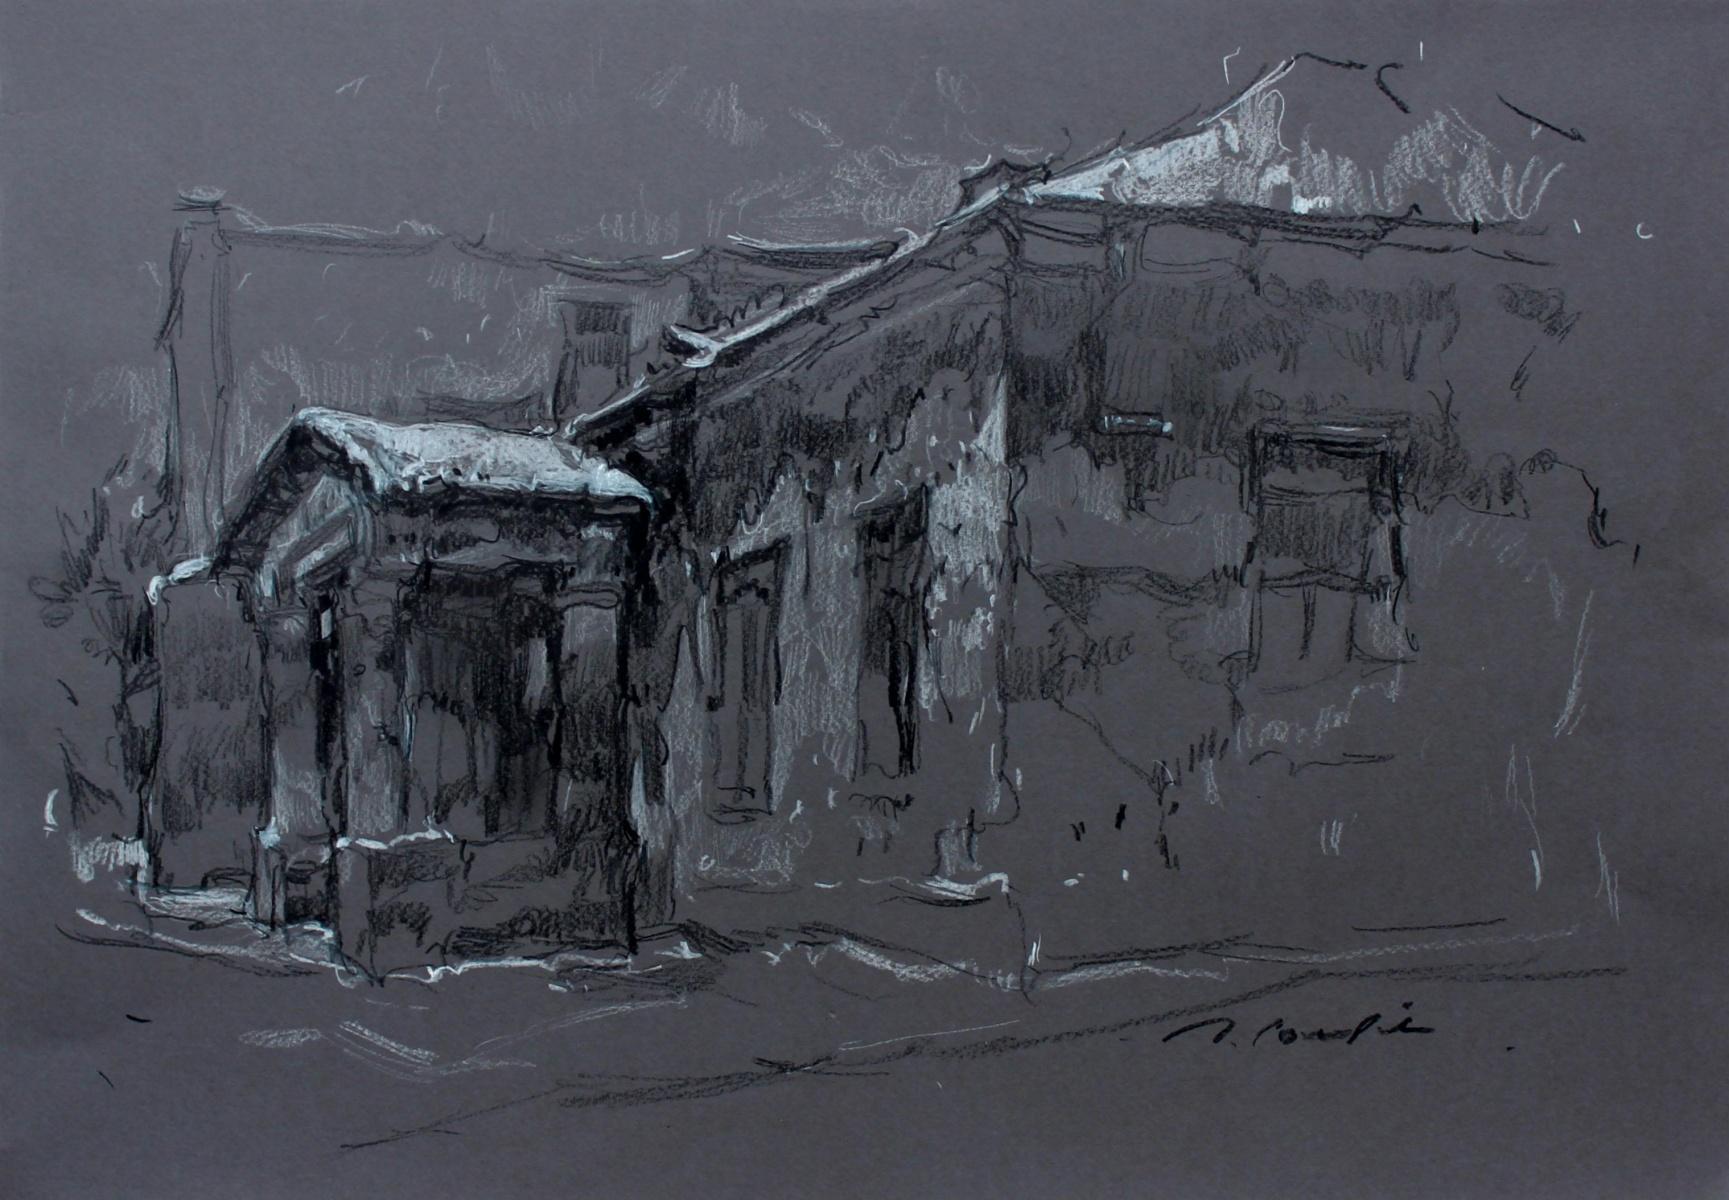 Opoczno - XXI century, Figurative landscape drawing, Black and white